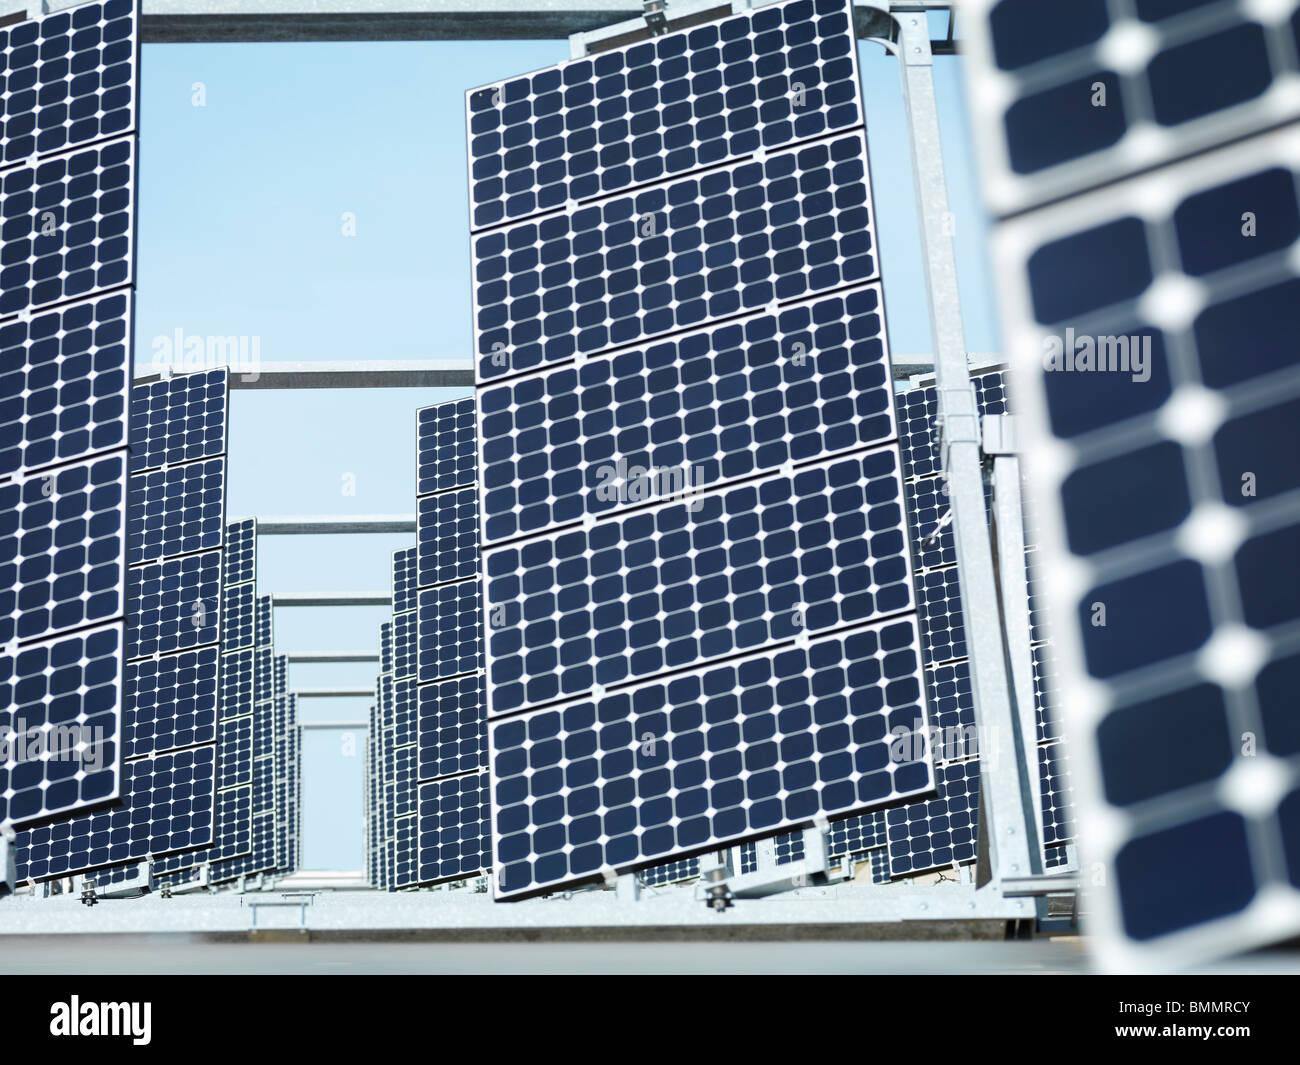 Solar power station front panels - Stock Image